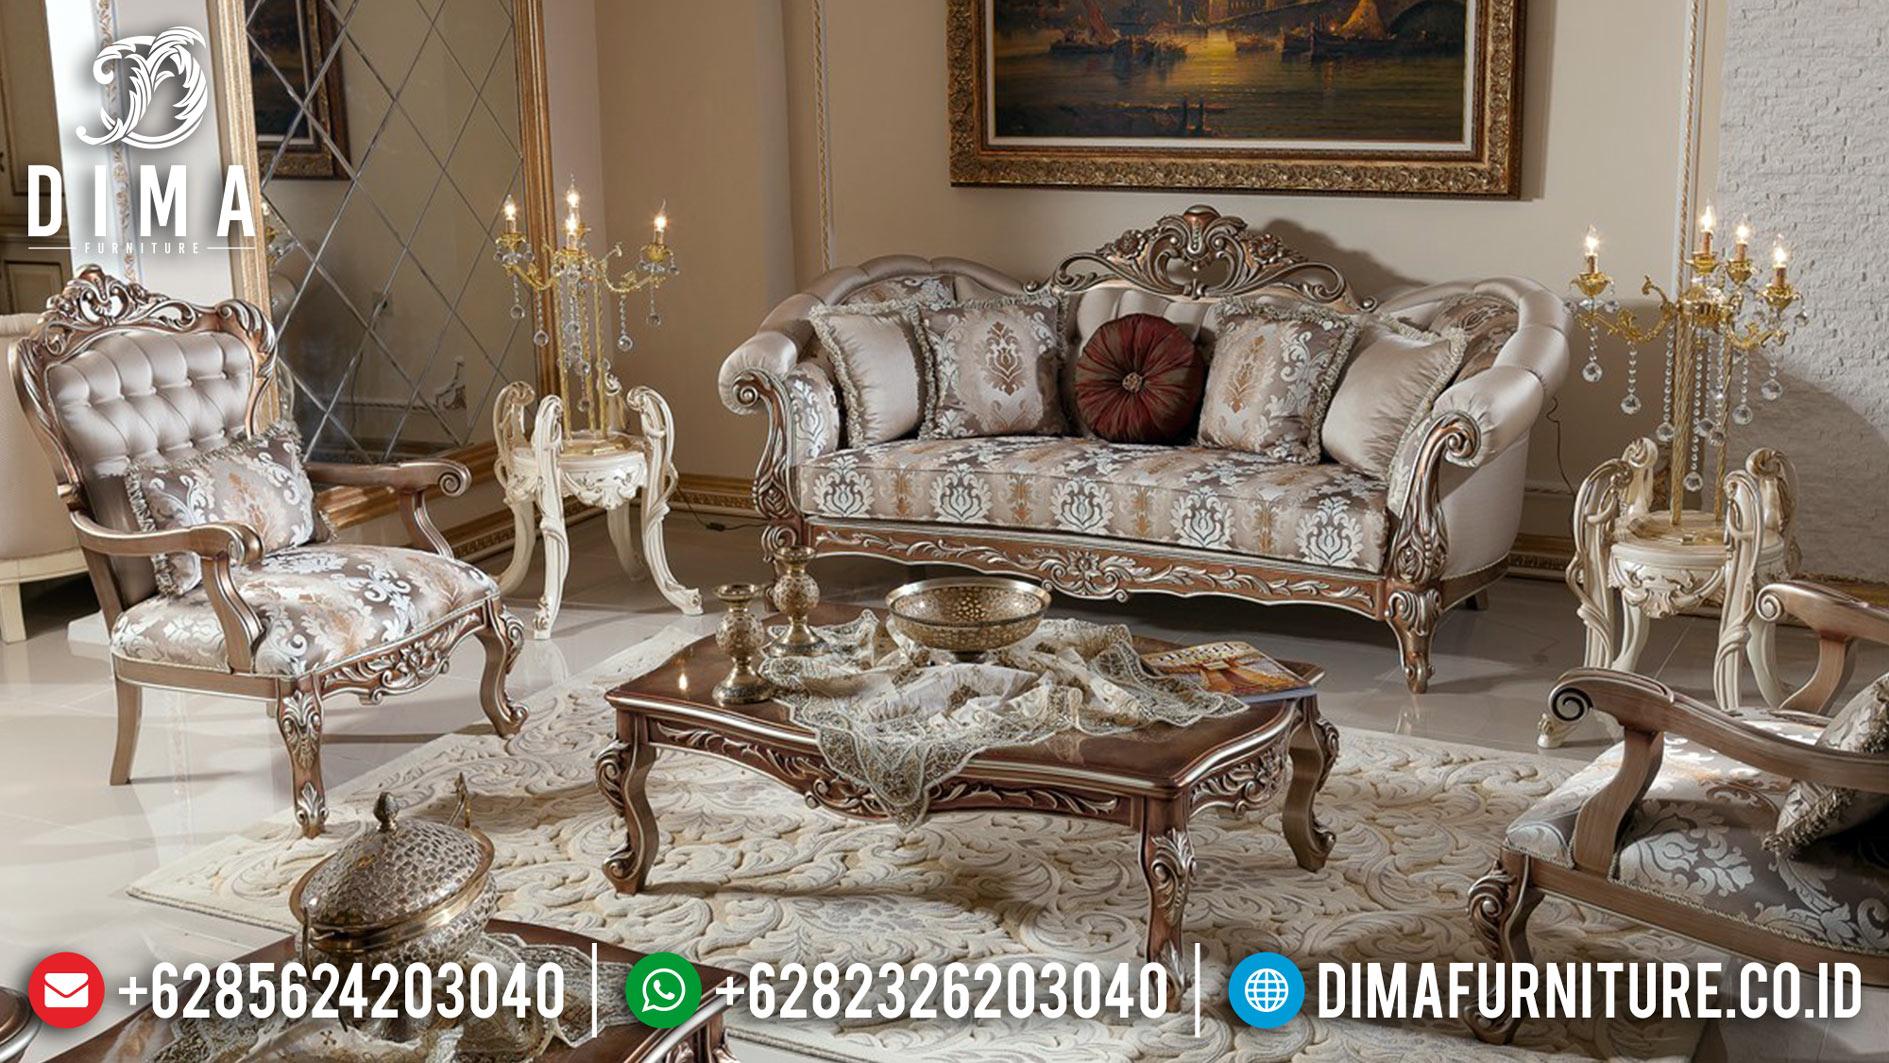 Thalia Set Sofa Tamu Mewah Jepara Ukiran Classic Luxury New Desain BT-0709